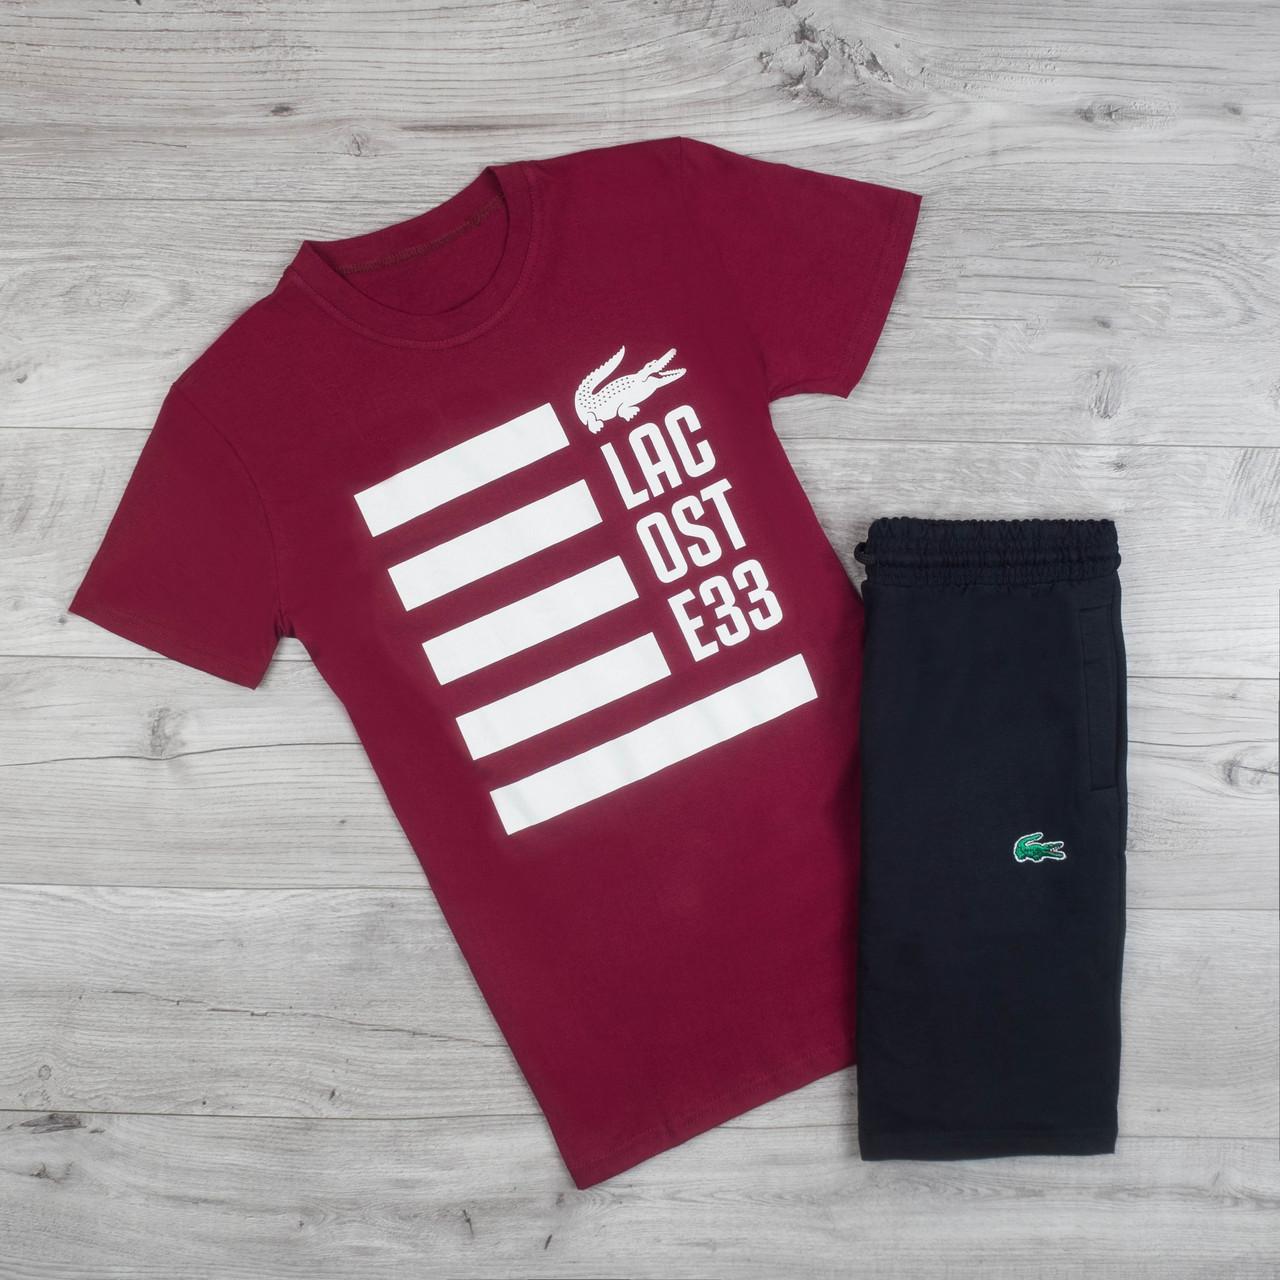 f82deb2b5647 Шорты + футболка в стиле Lacoste / мужской спортивный костюм летний ...